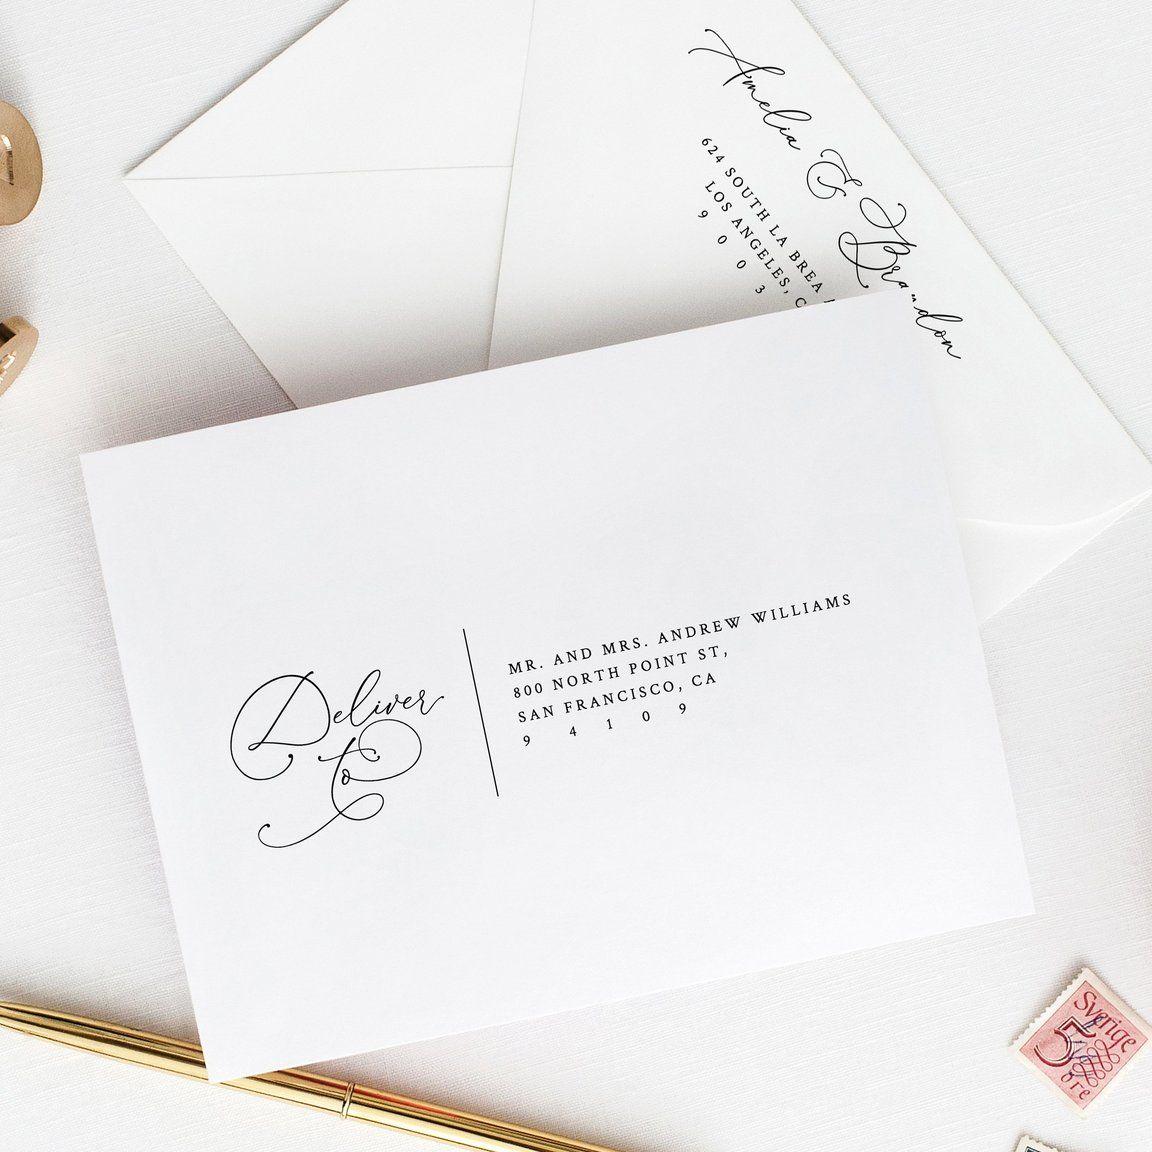 Wedding Envelope Template Printable Address Envelope Diy Wedding Address Wedding Invitations Labels Addressing Envelopes Wedding Wedding Invitation Envelopes